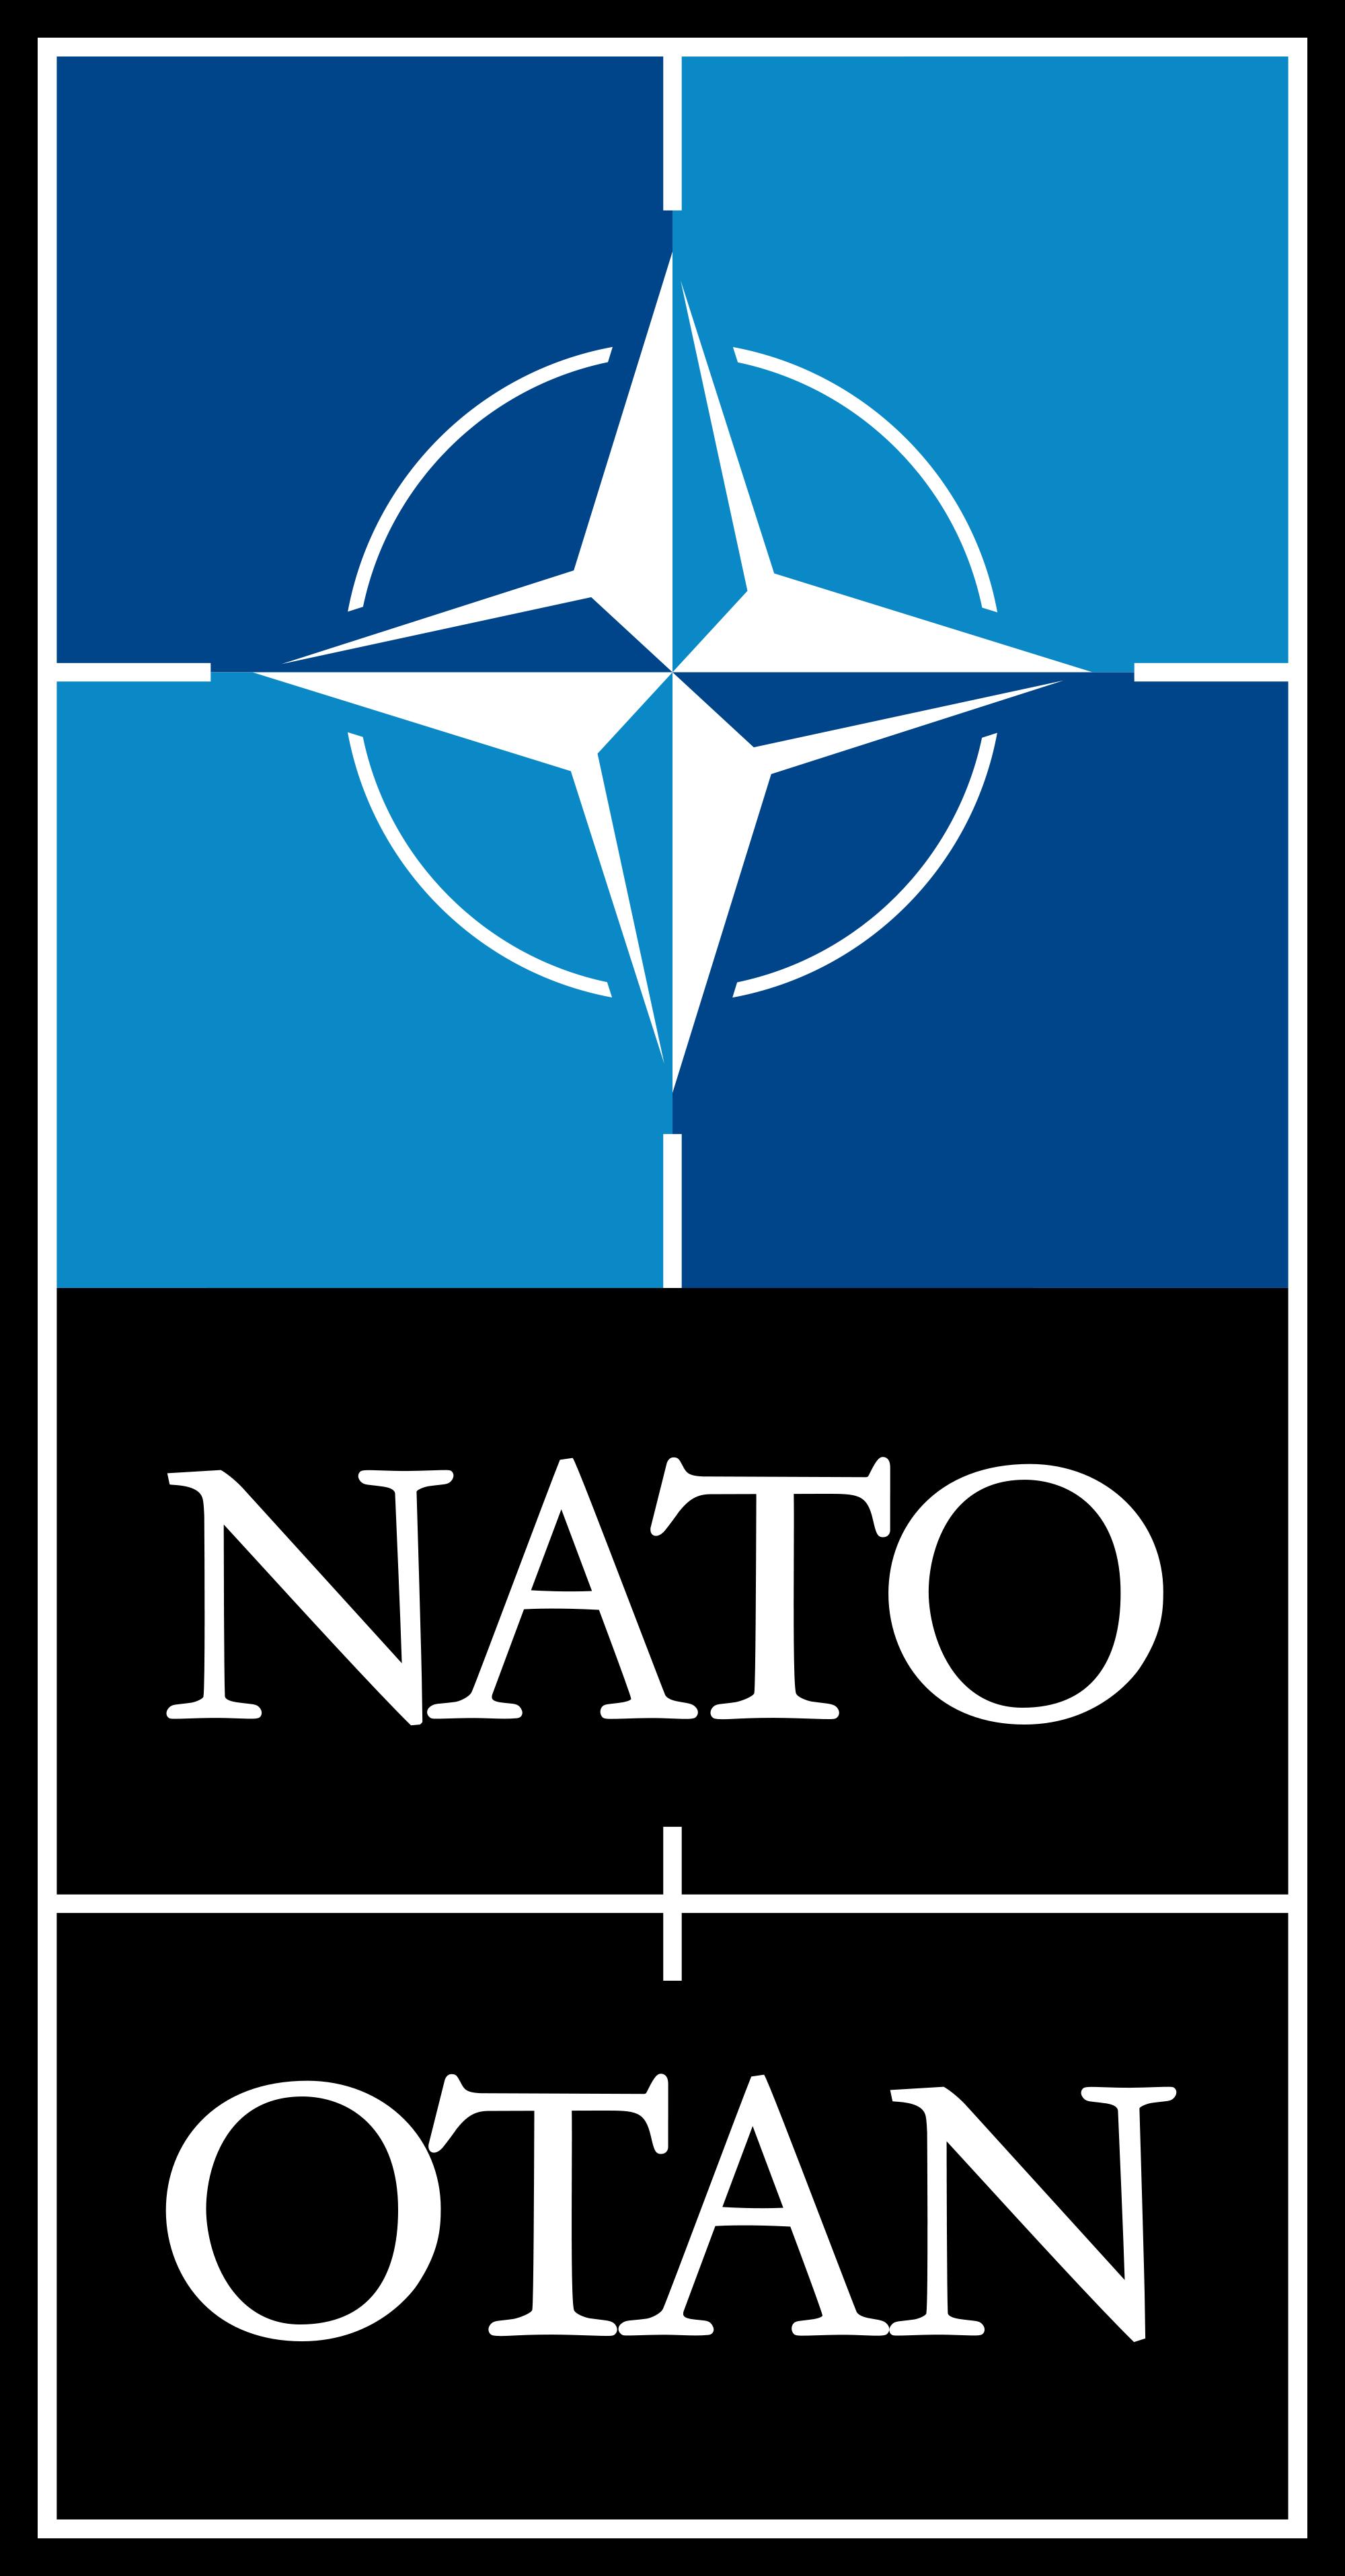 File:NATO OTAN landscape logo.svg.